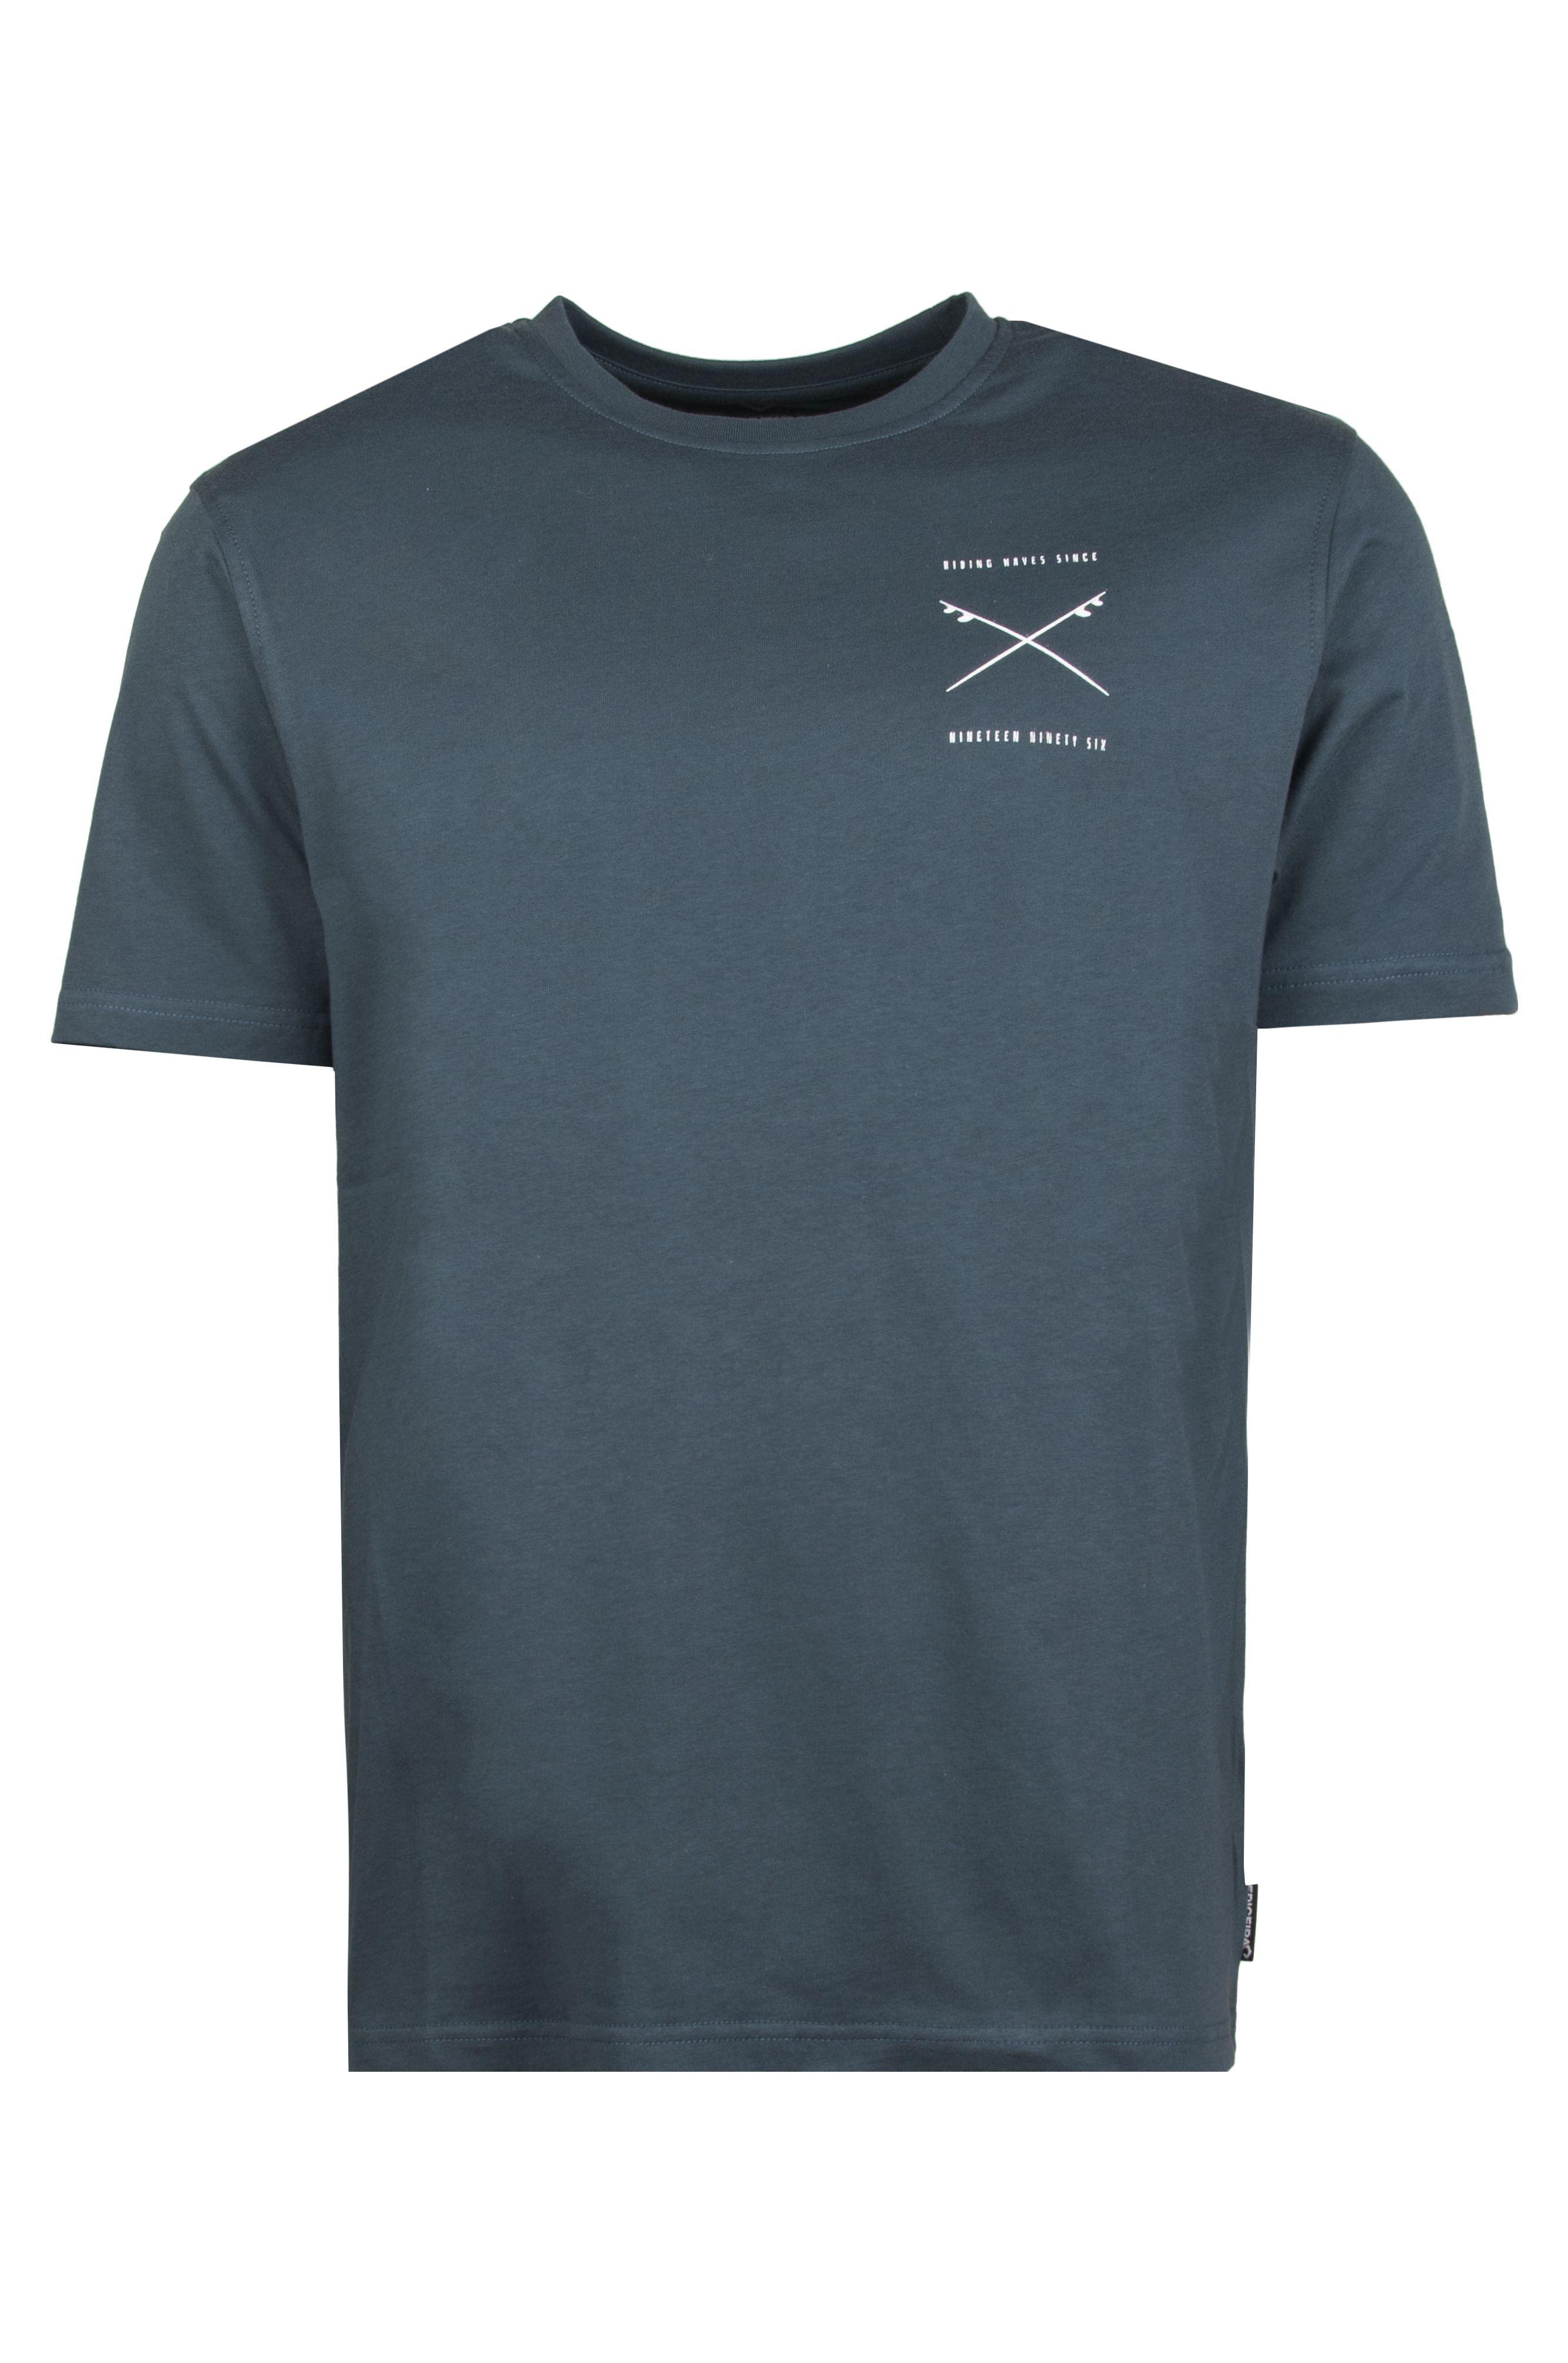 T-Shirt Ericeira Surf Skate KAIKURA Navy Tan